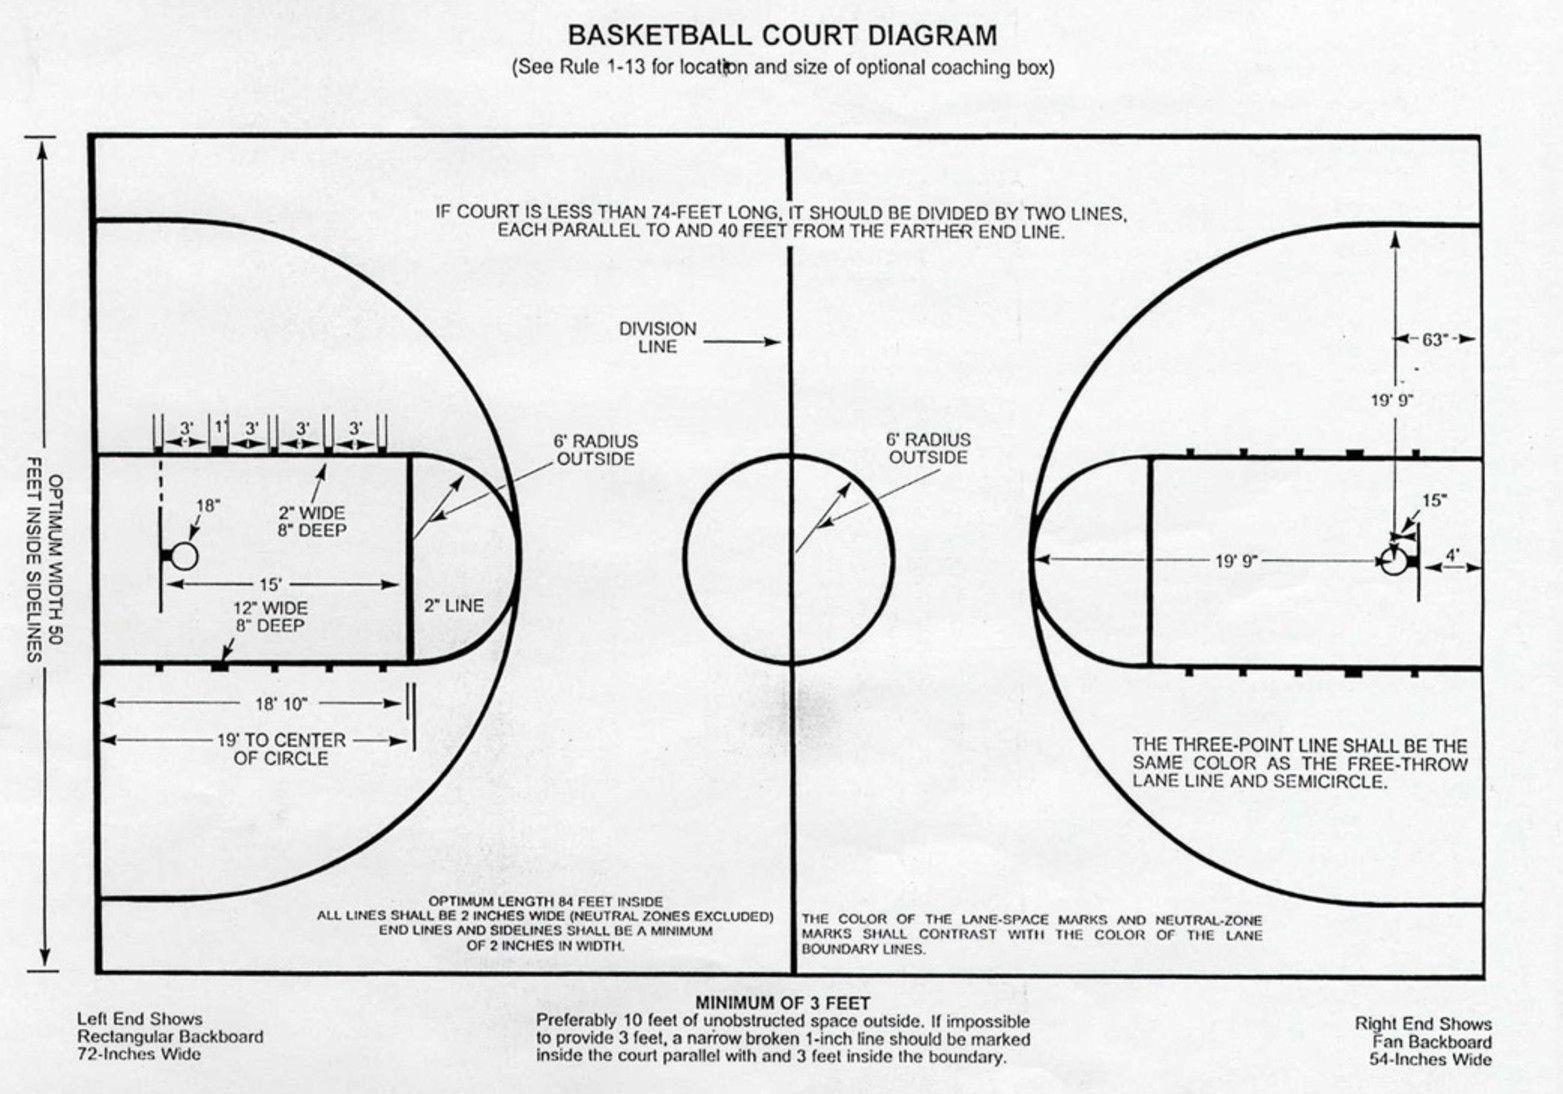 50 Basketball Court Diagram With Measurements Xk7n Di